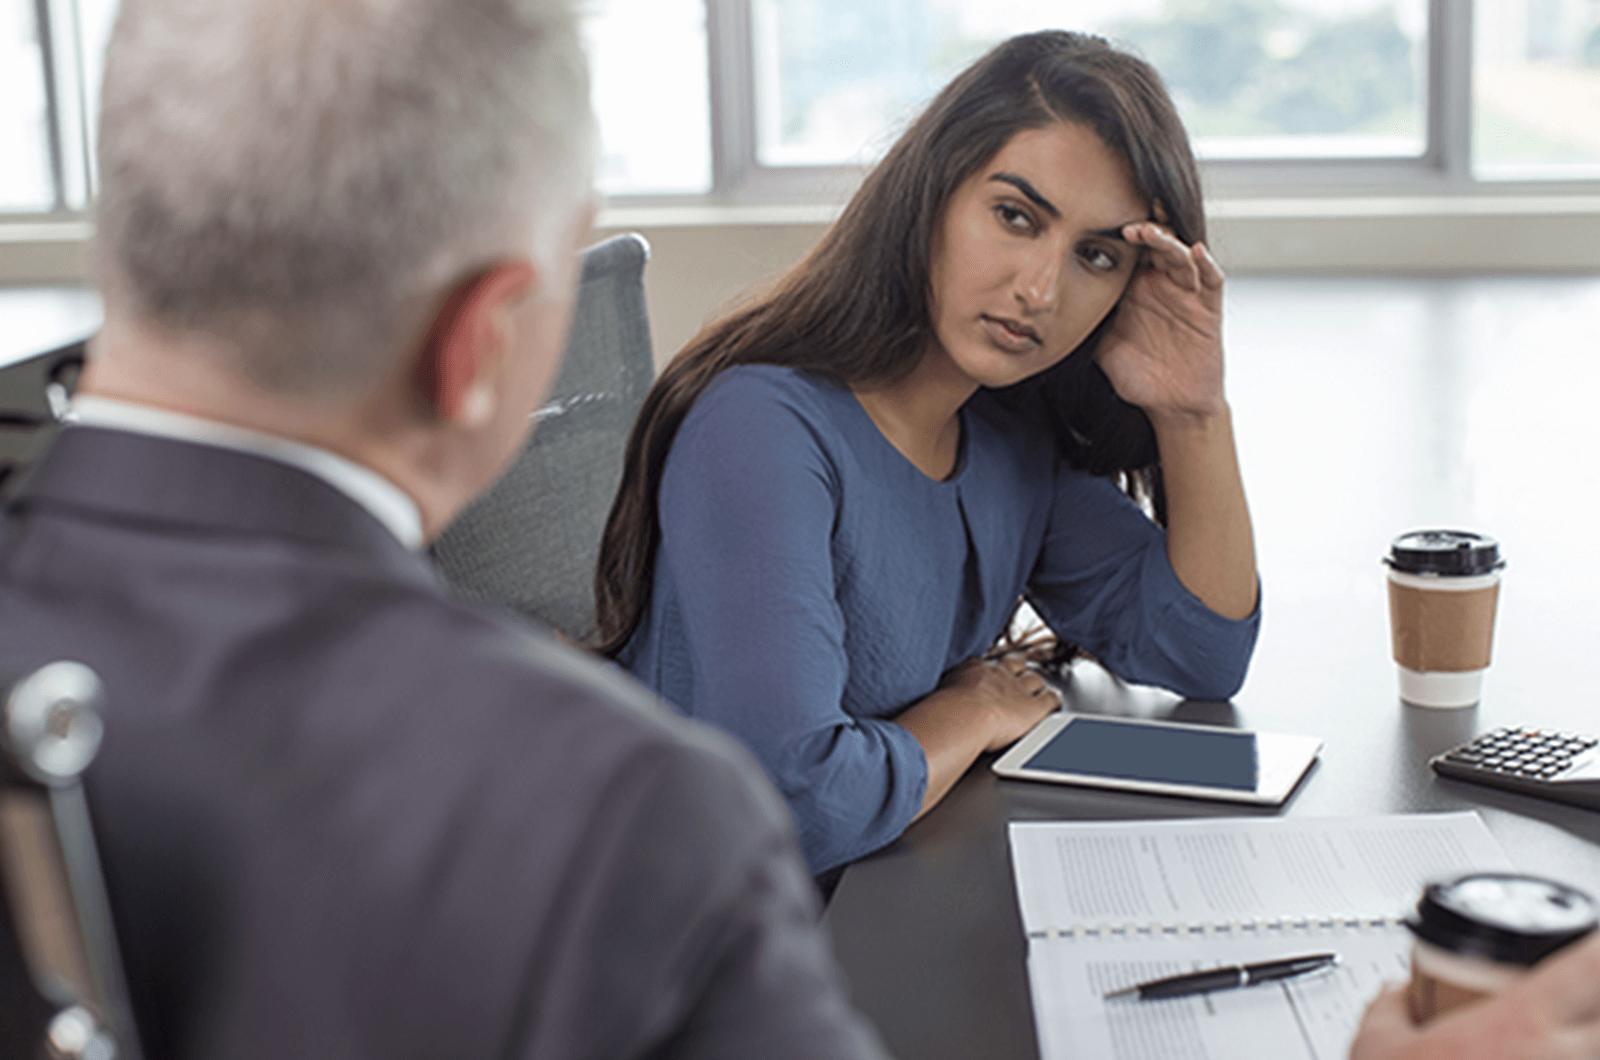 Woman in blue shirt receiving feedback from man